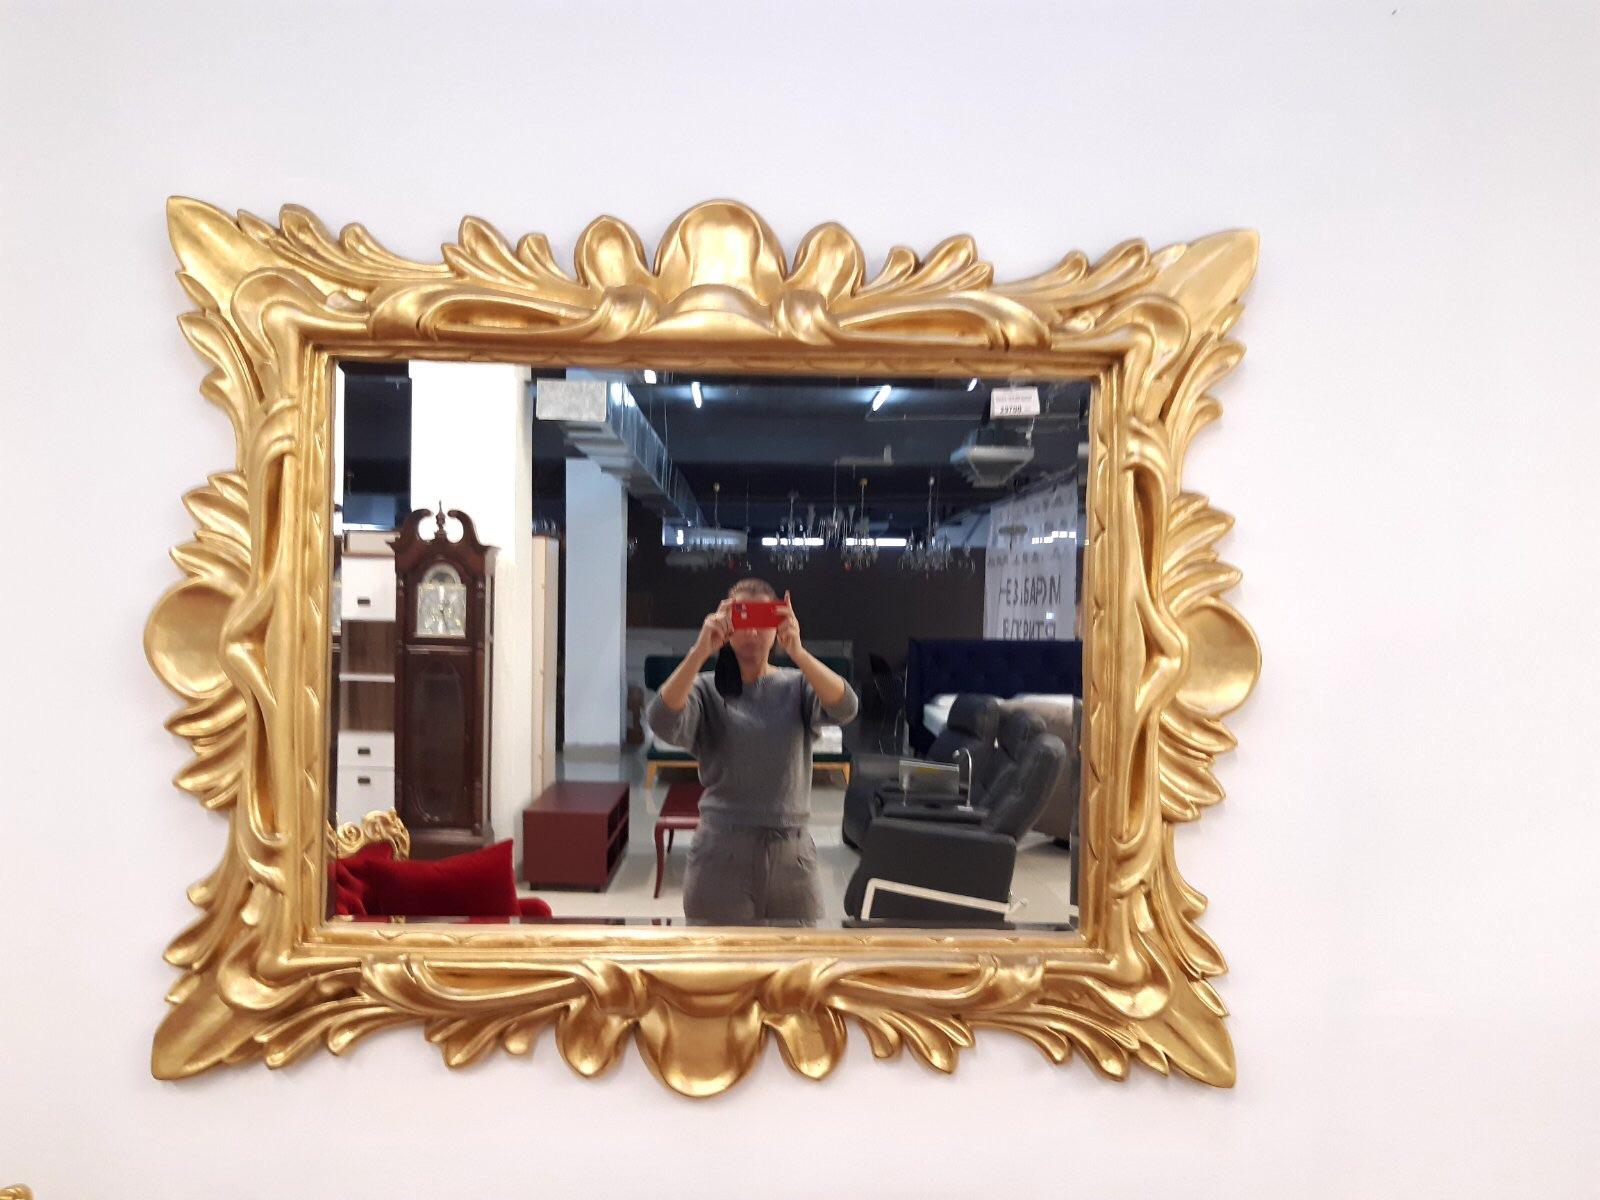 Scappini Настенное зеркало от итальянского производителя Scappini